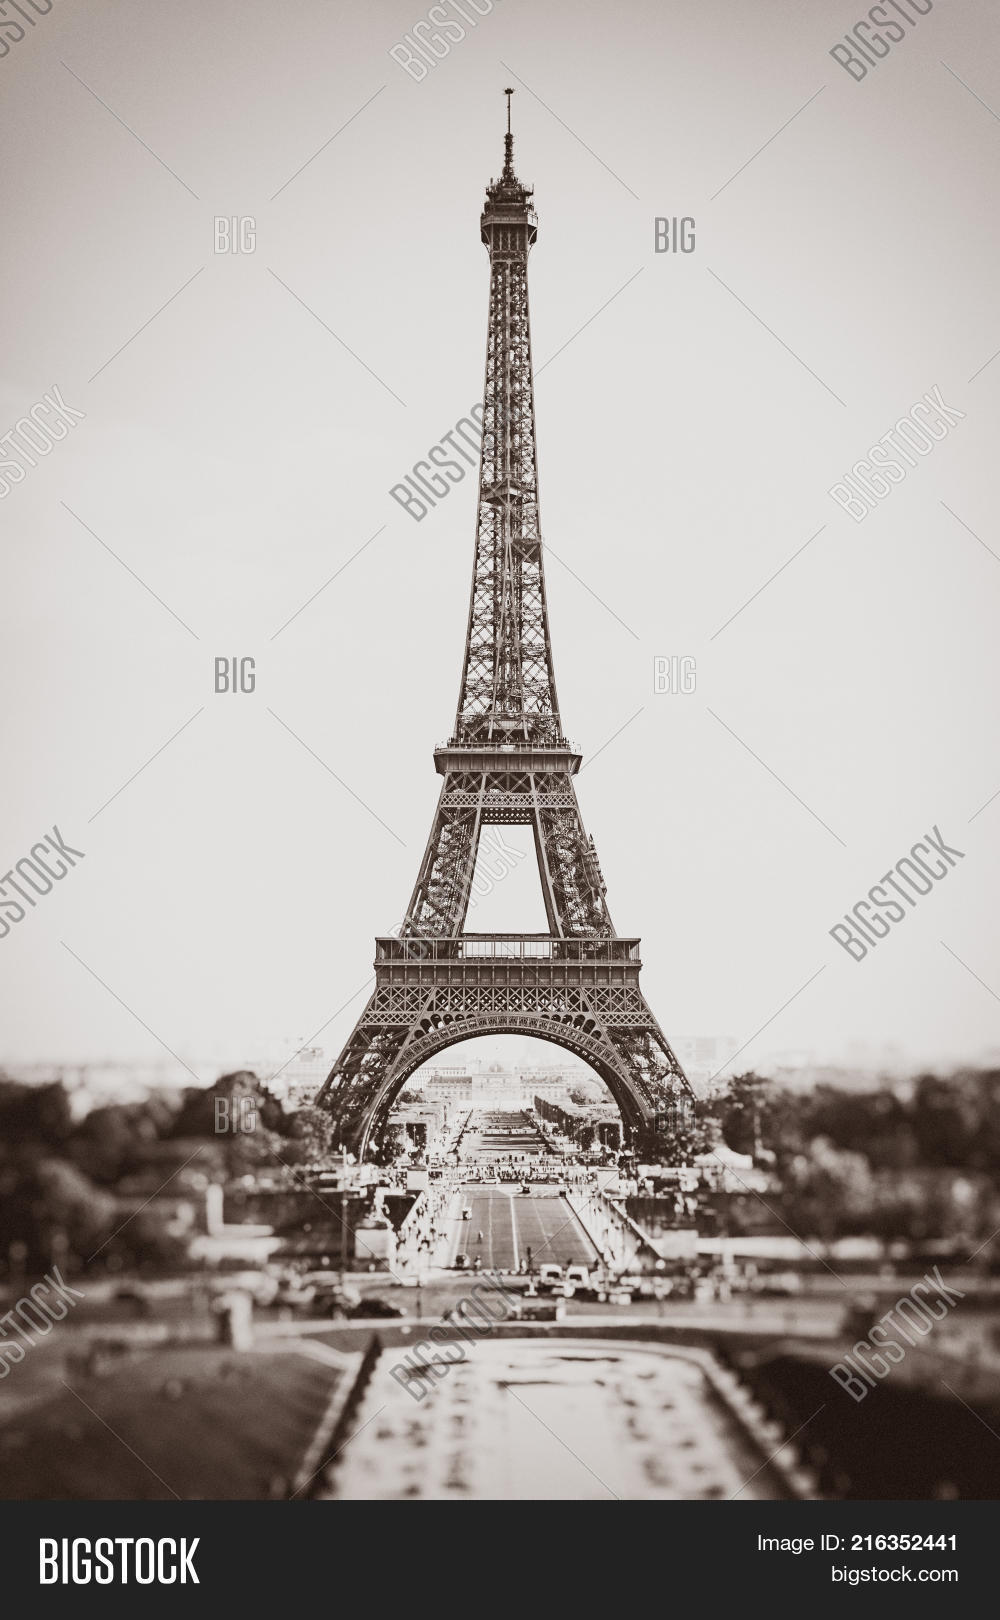 Eiffel Tower Paris Image & Photo (Free Trial)   Bigstock